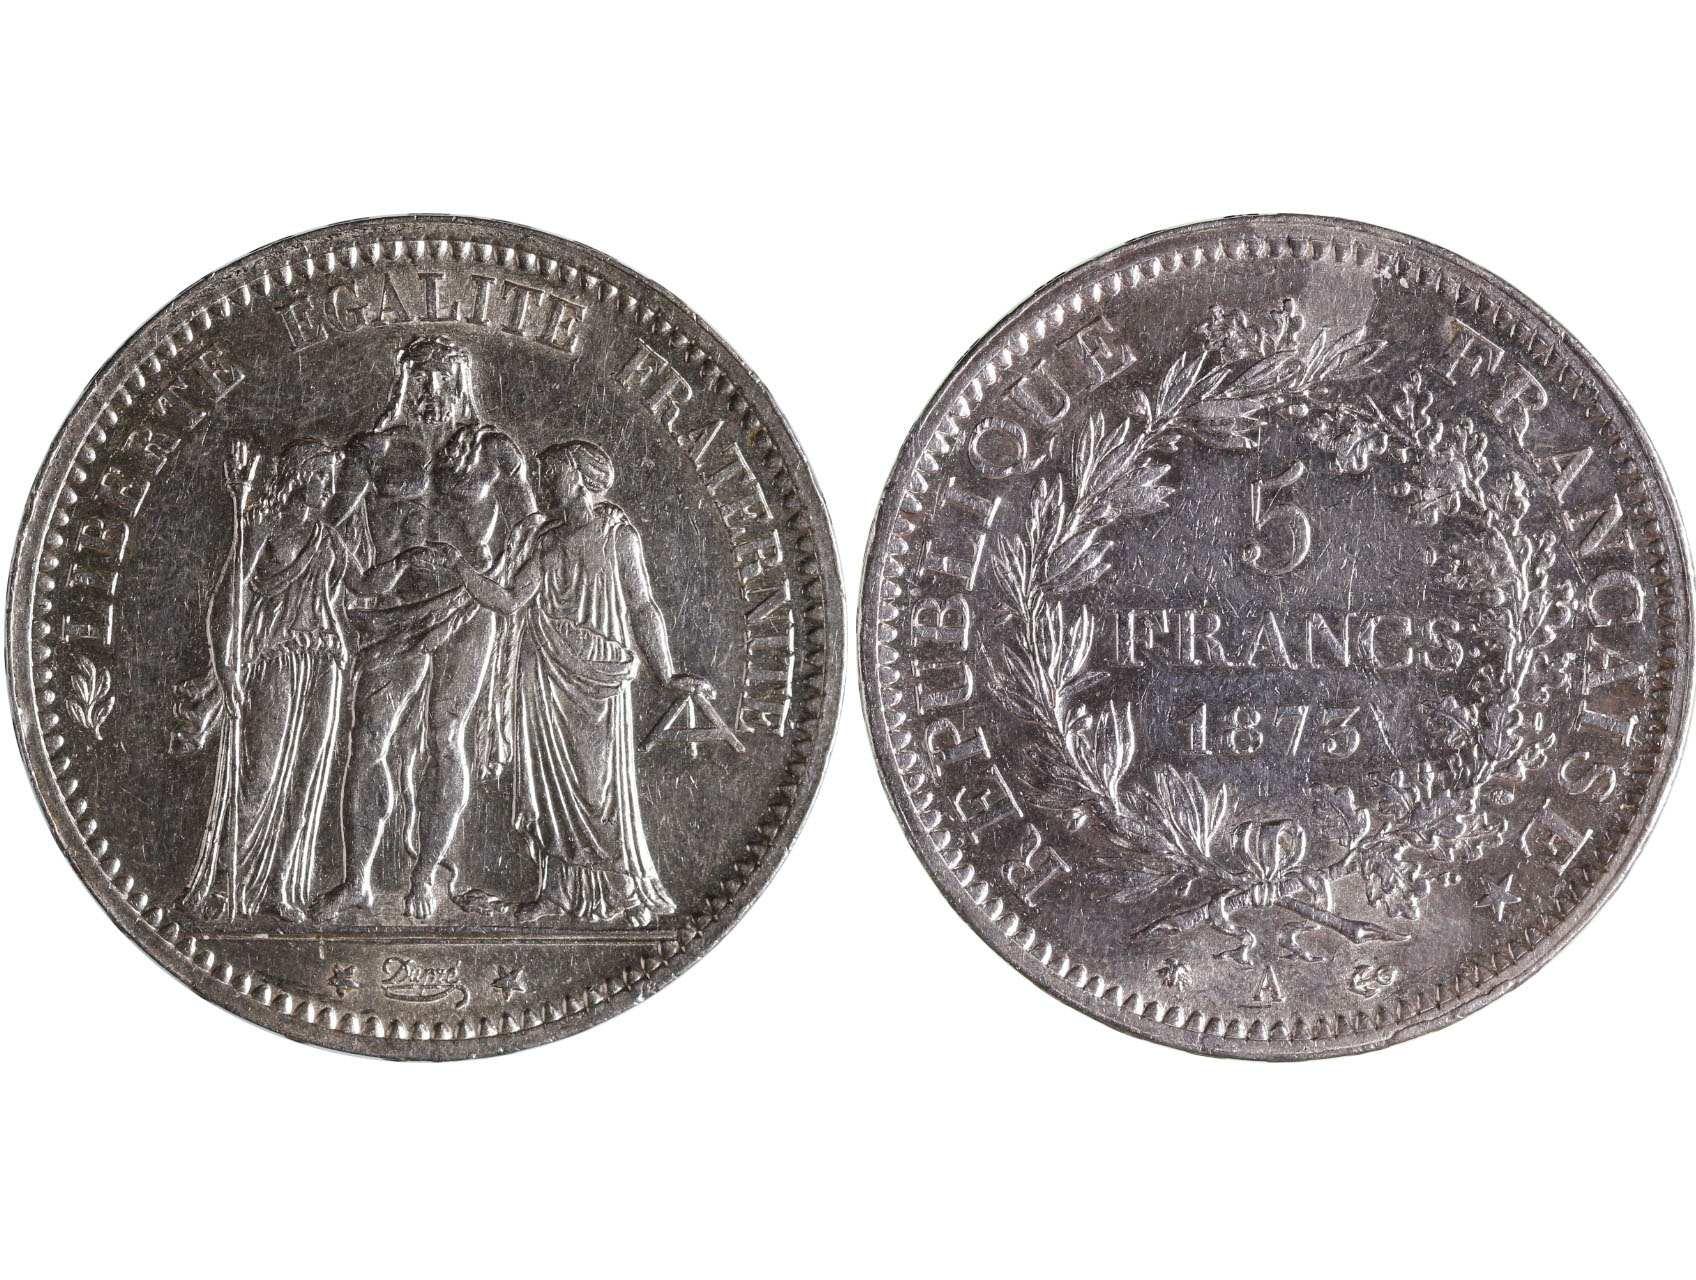 Francie republika 1870 - 5 Frank 1873 A, KM 820.1